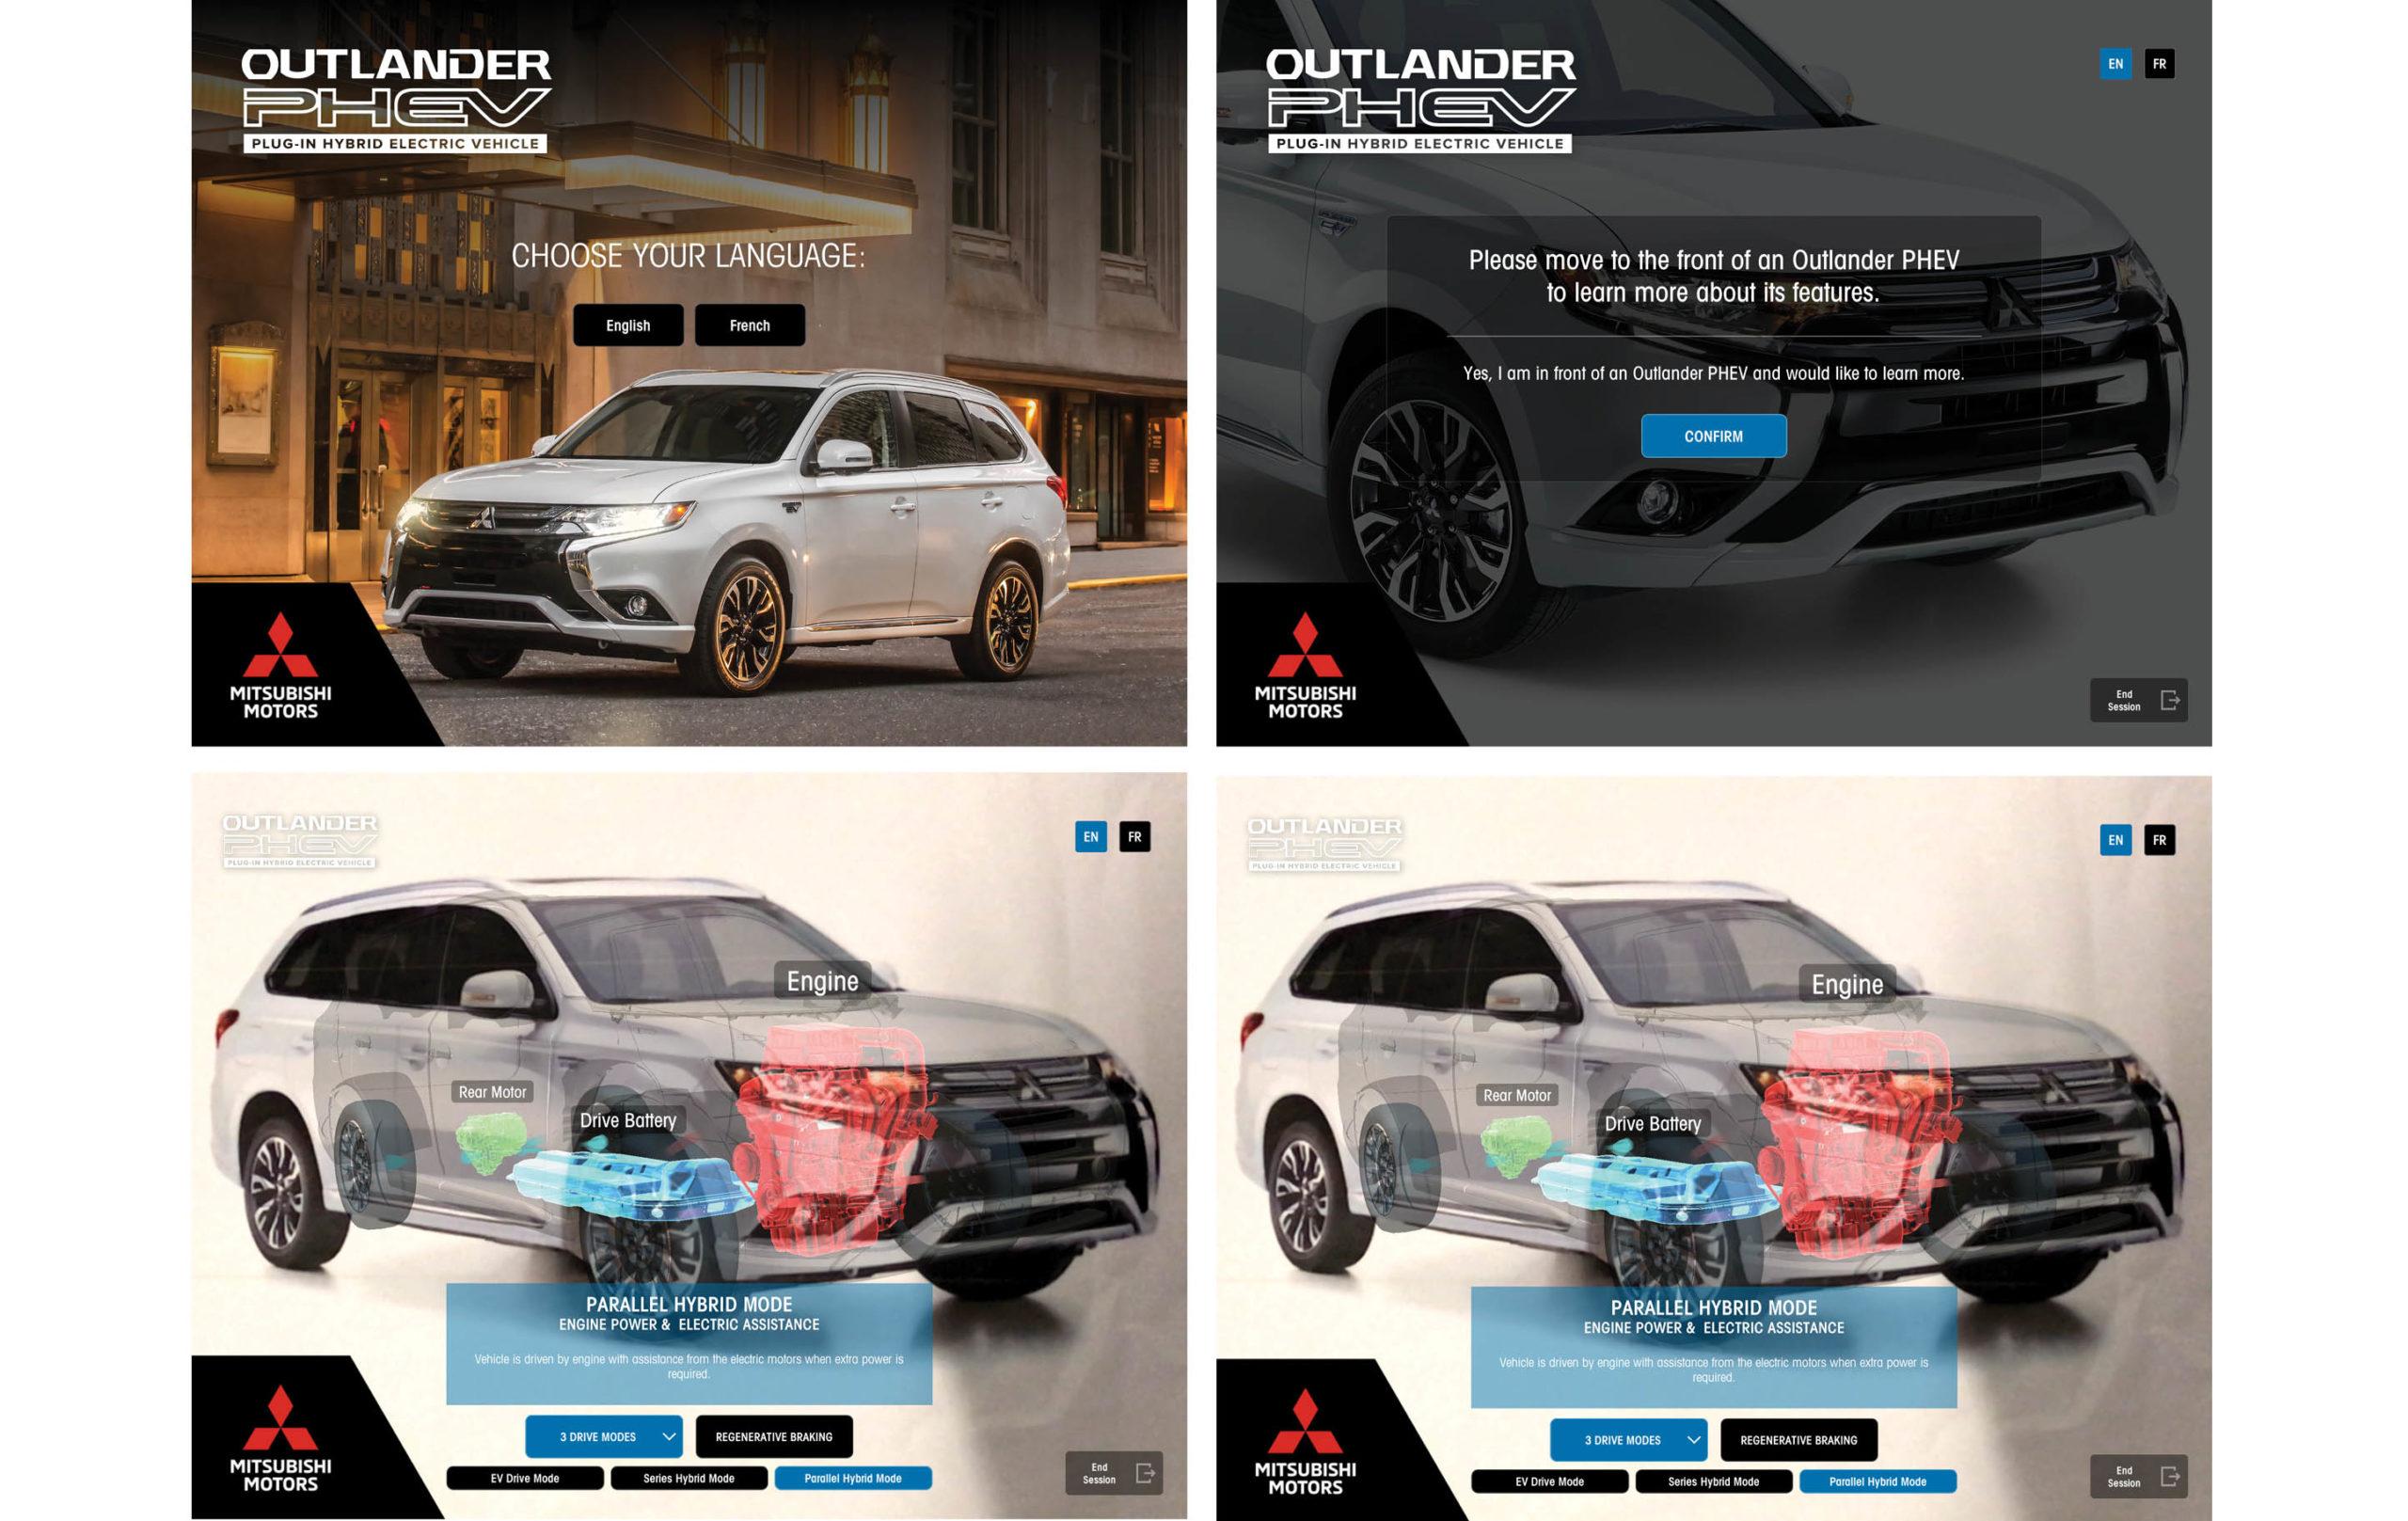 Mitsubishi Outlander augmented reality